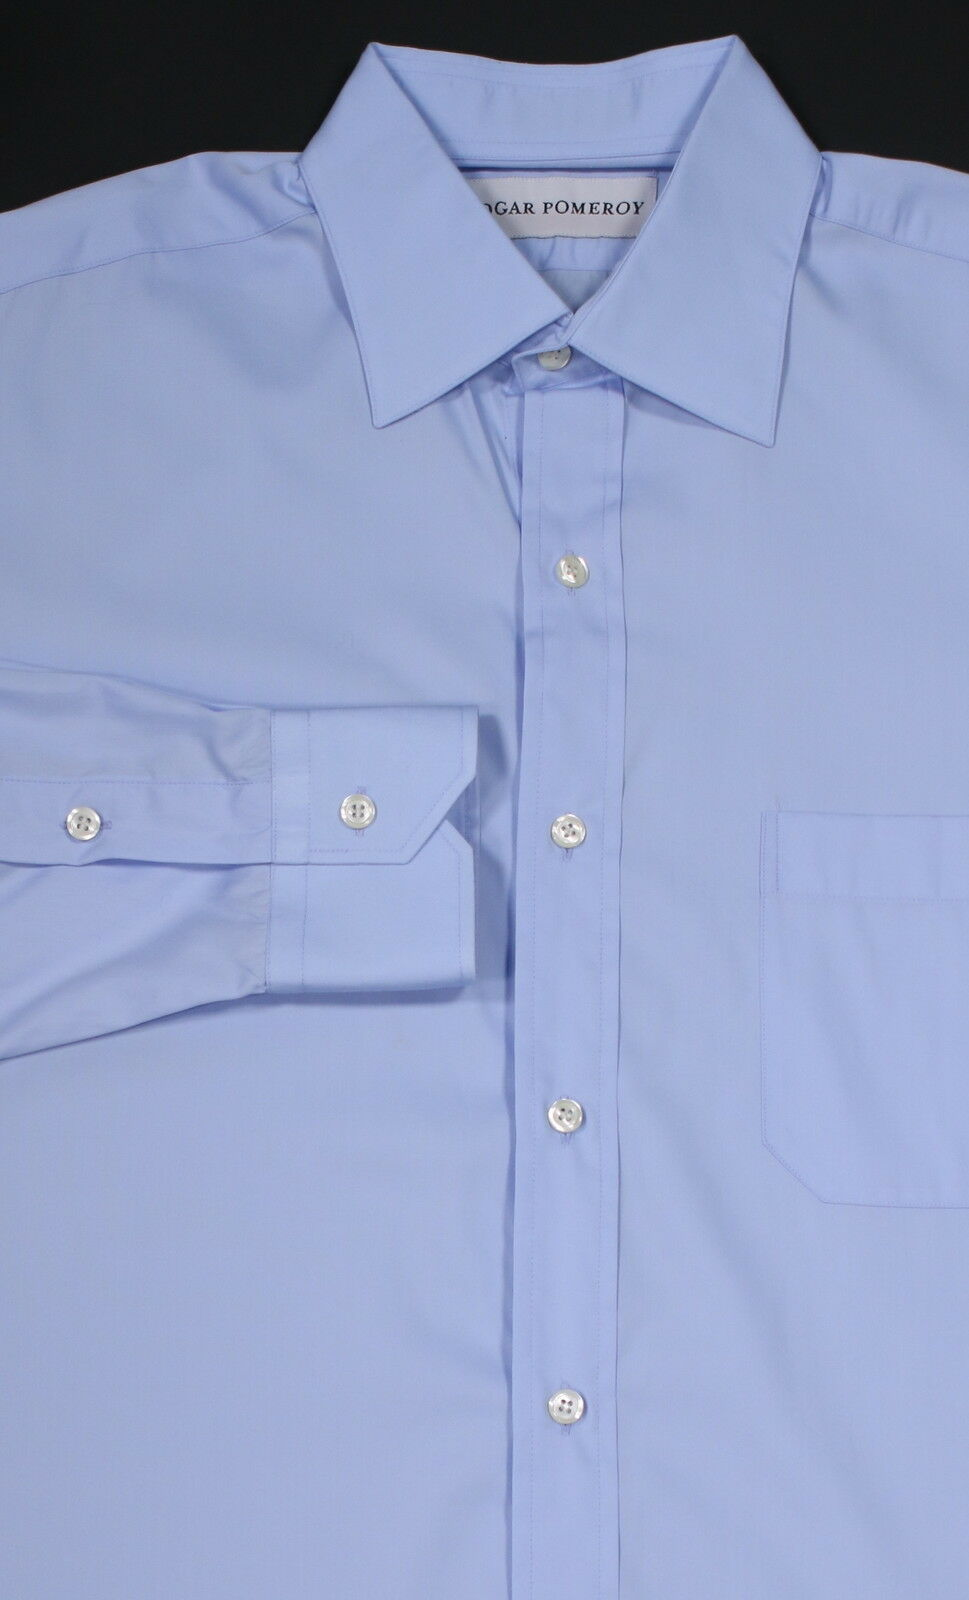 Neu  Edgar Pomeroy Light Blau Baumwolle Handgefertigt Anzugshemd 15.5-35